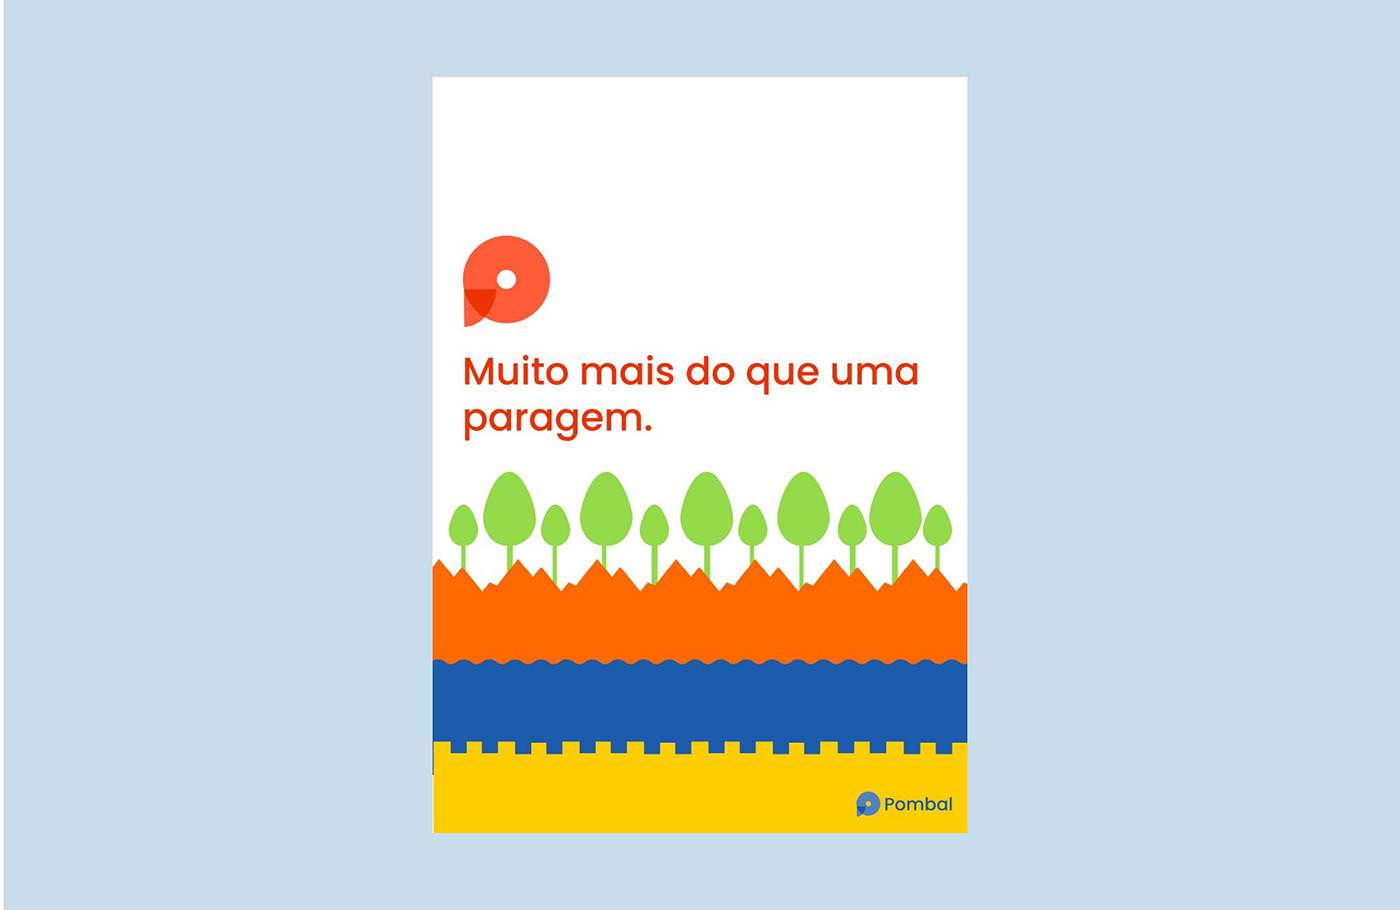 branding  city design city identity identidy Identity Design logo marketing   pigeon Pombal Portugal